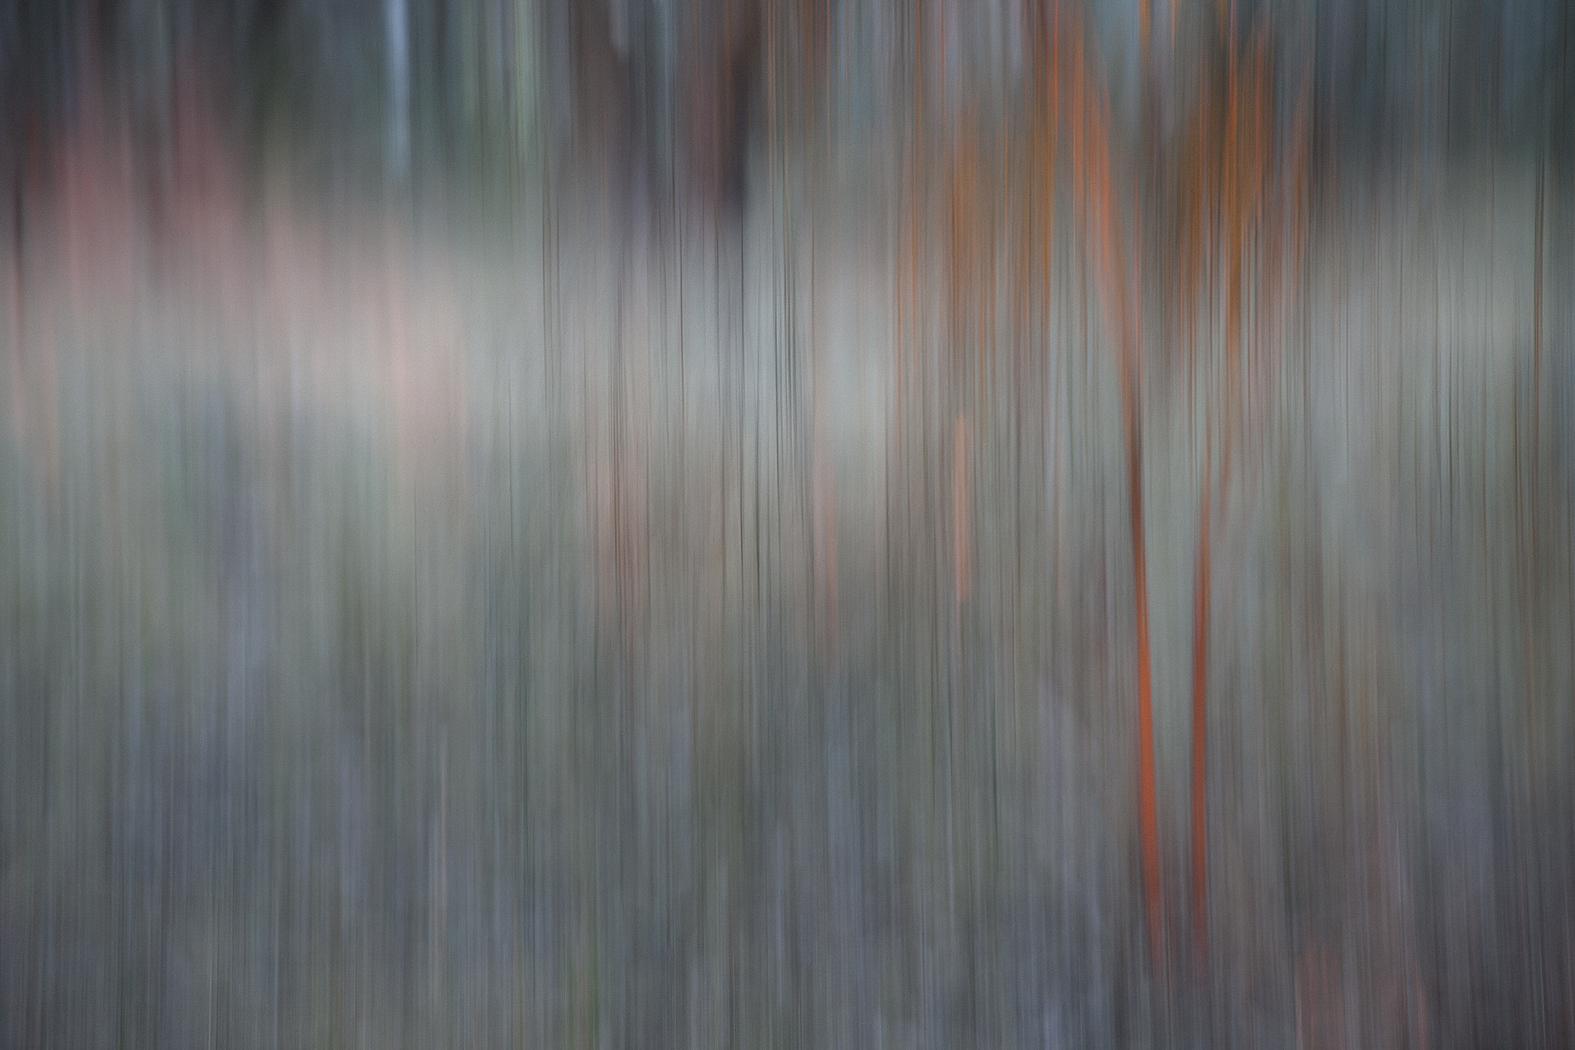 woodlands_#6.jpg